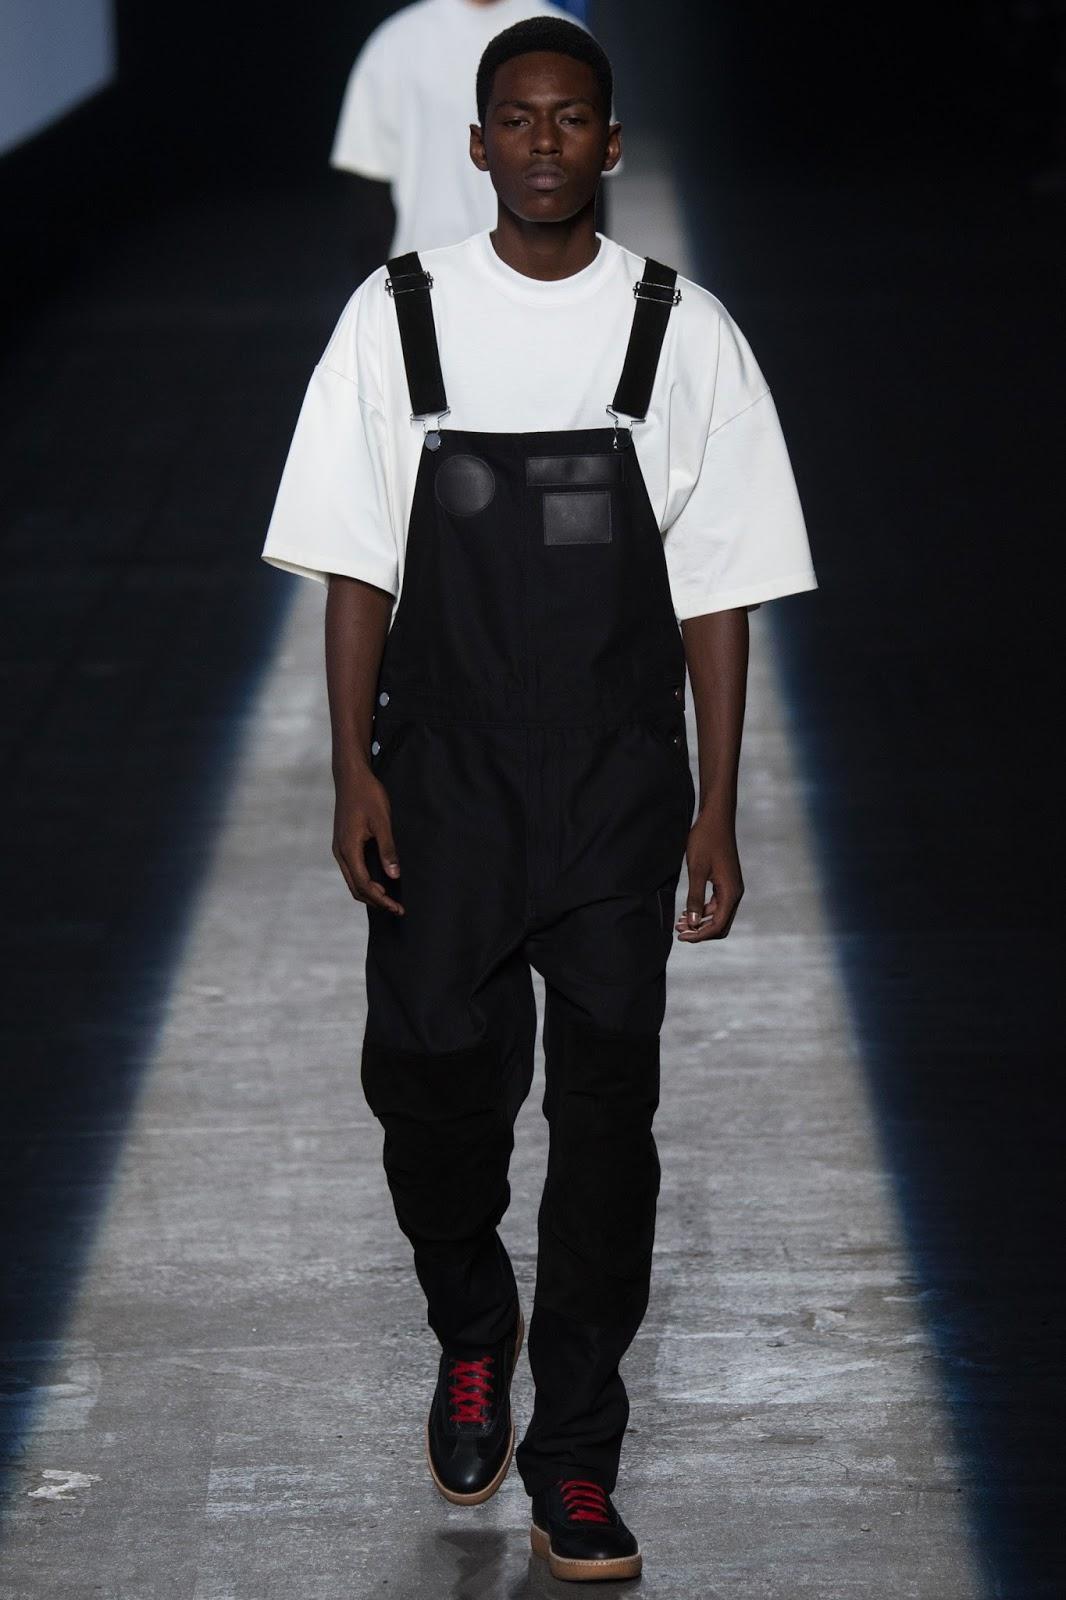 NYFW new york fashion week dungarees menswear